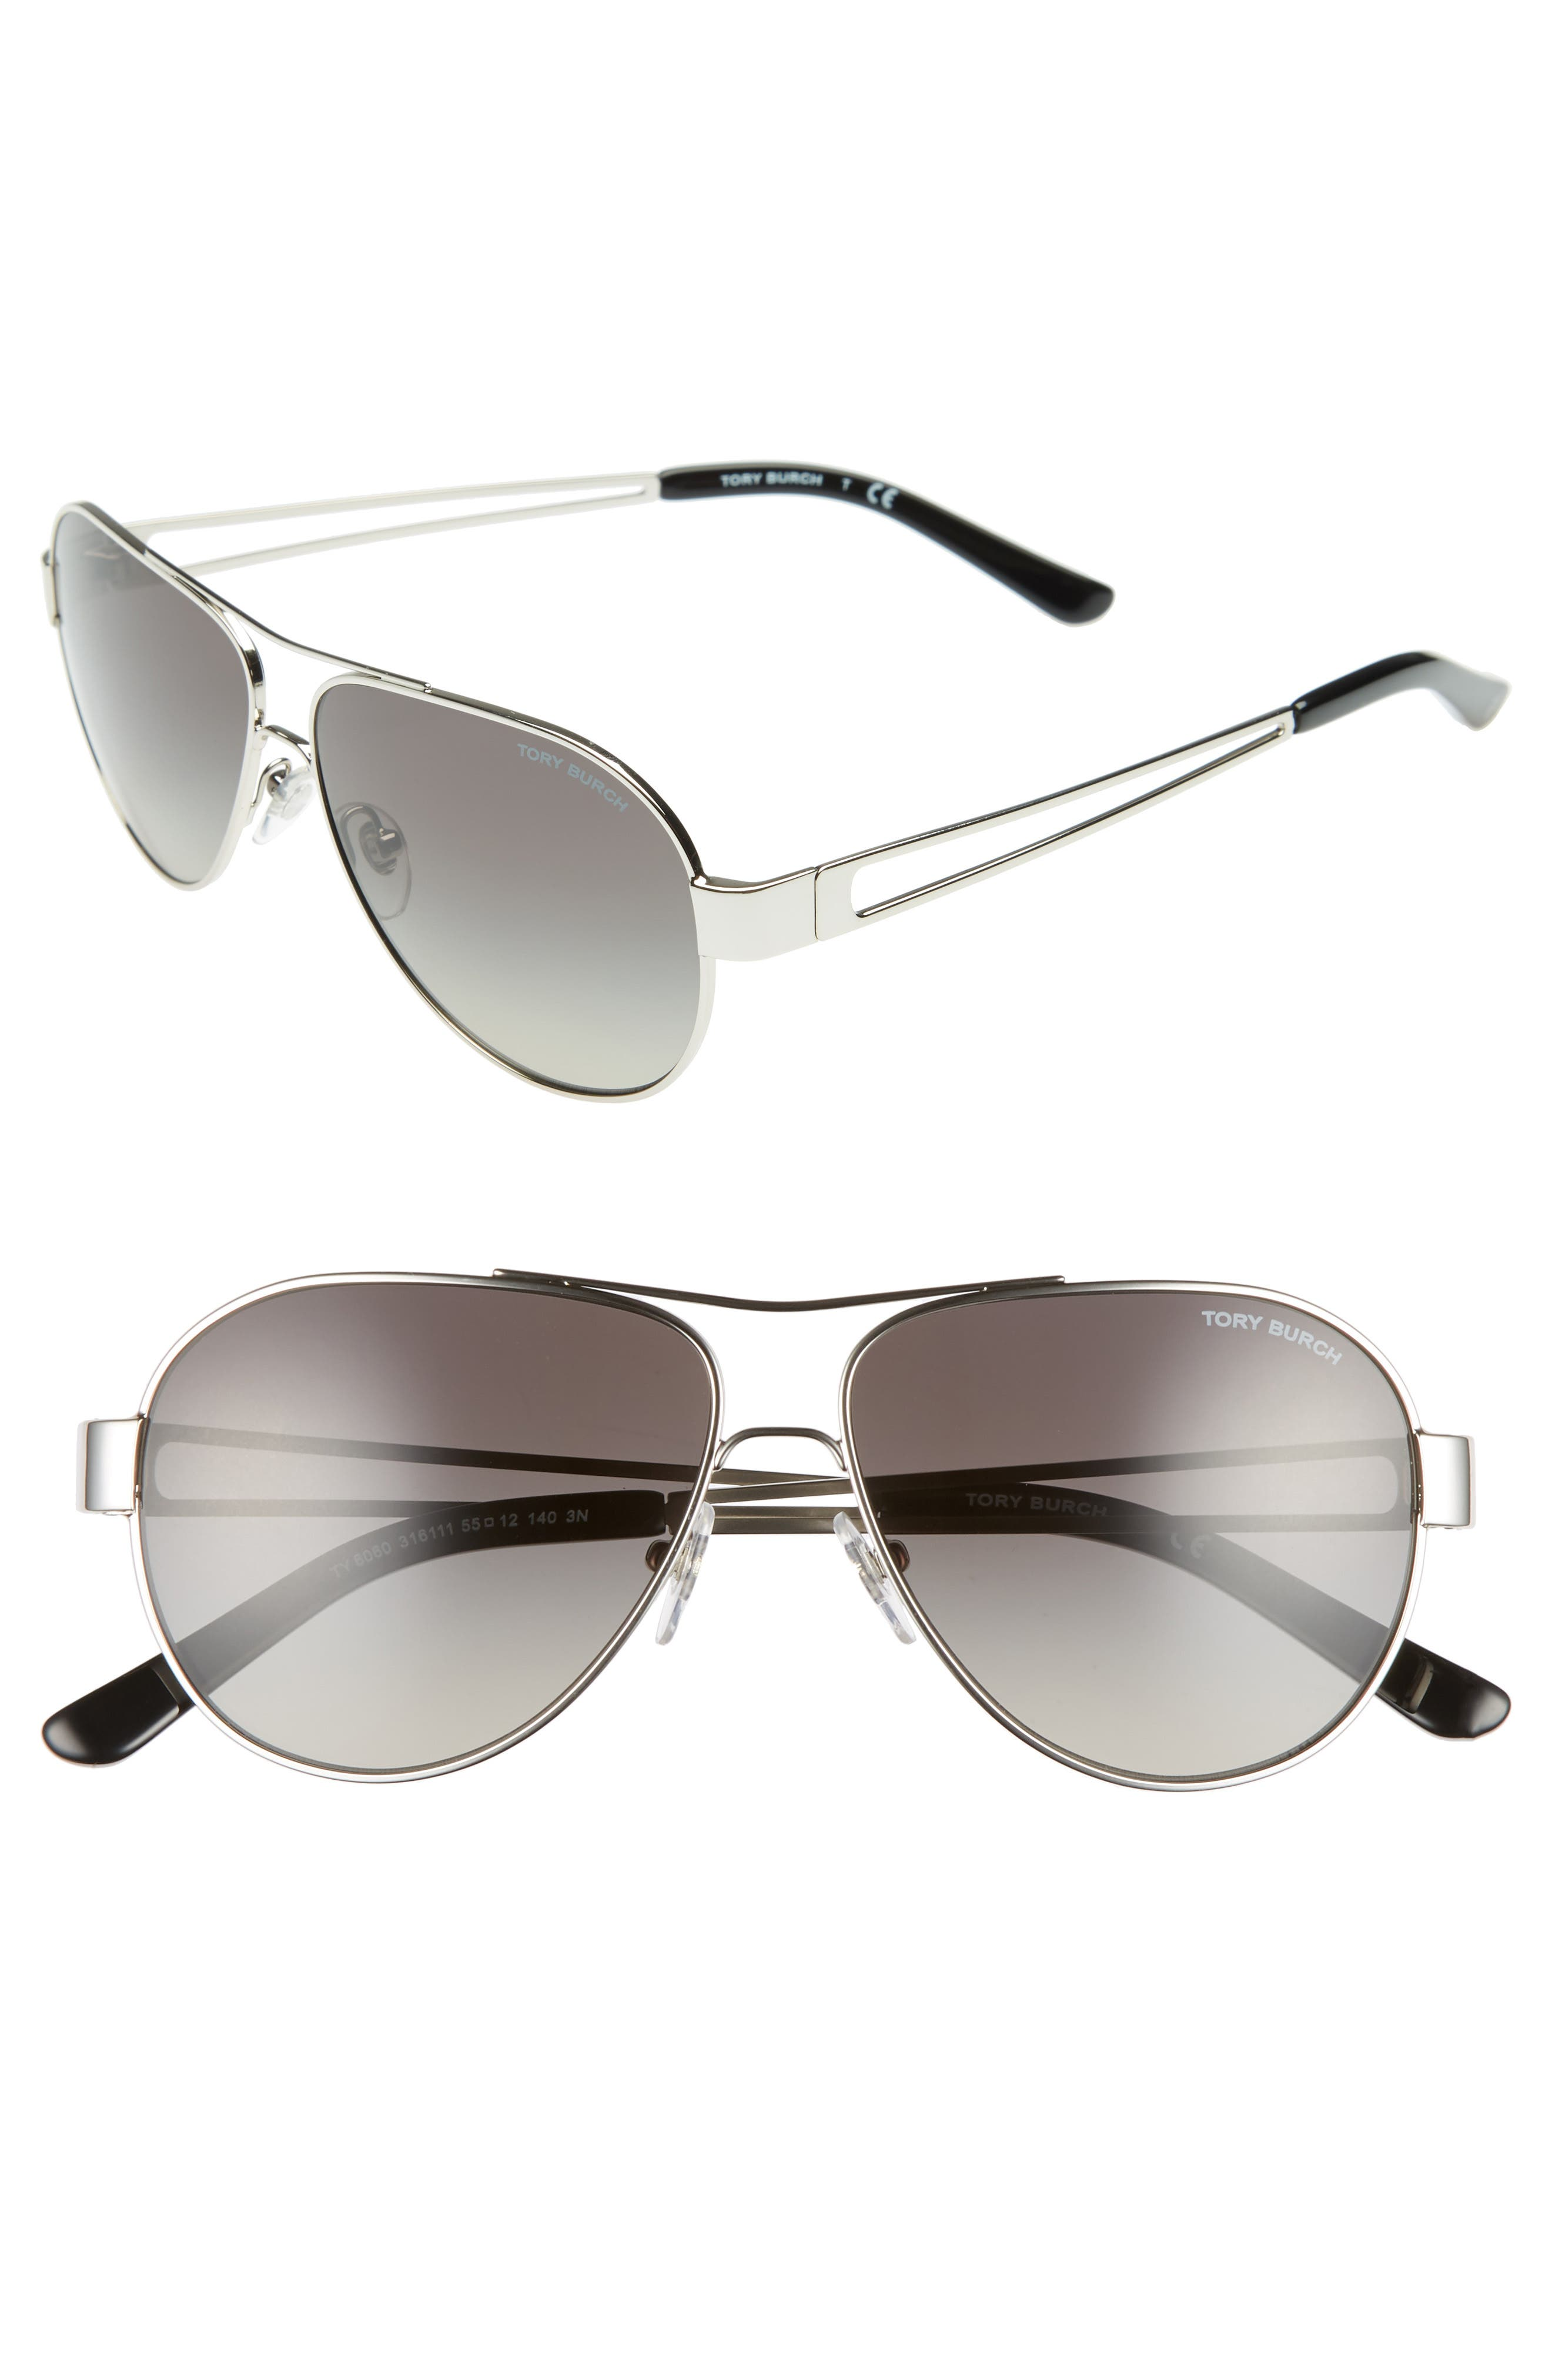 55mm Polarized Aviator Sunglasses,                             Main thumbnail 1, color,                             Silver/ Black Gradient